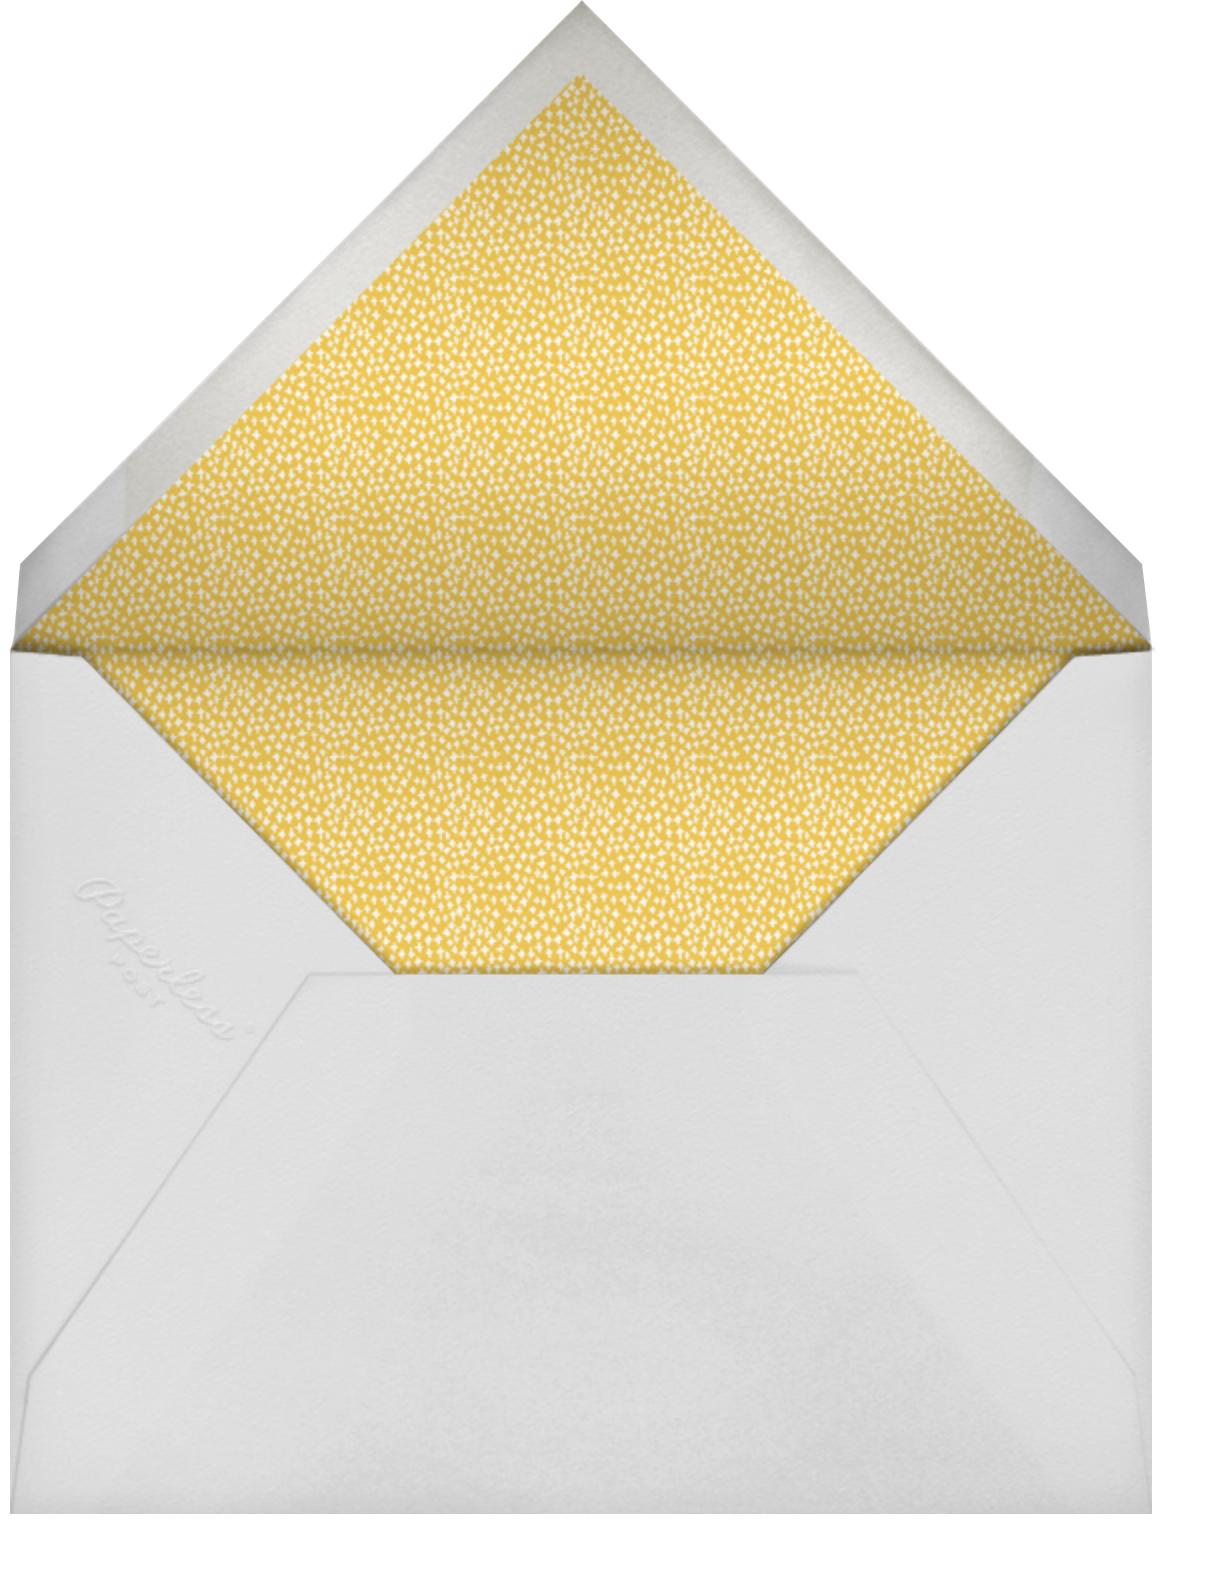 Among the Daisies - Blossom - Mr. Boddington's Studio - Thank you - envelope back